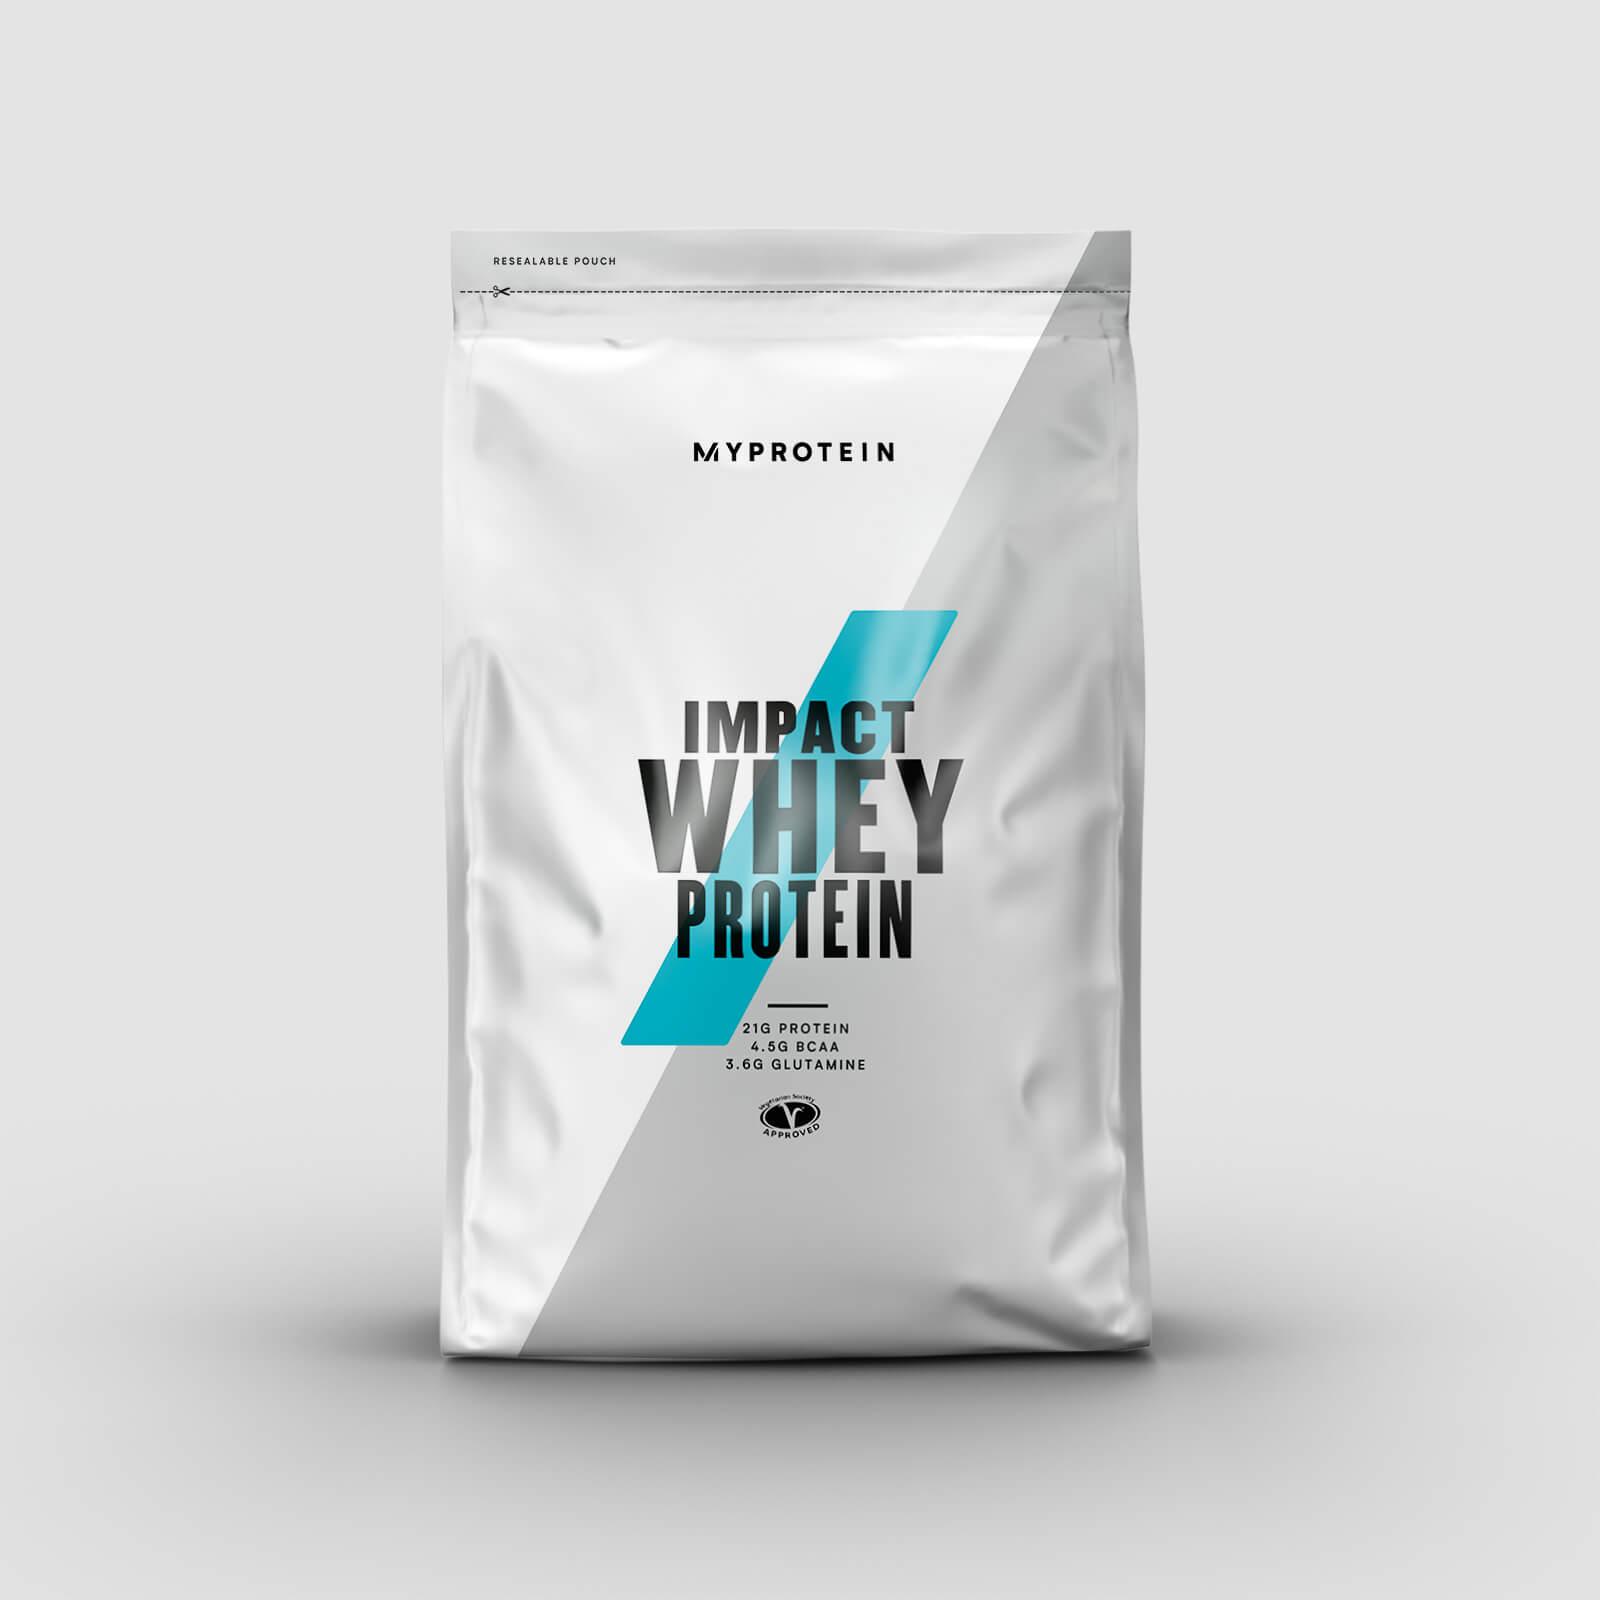 Impact Whey Protein - 5kg - Blueberry